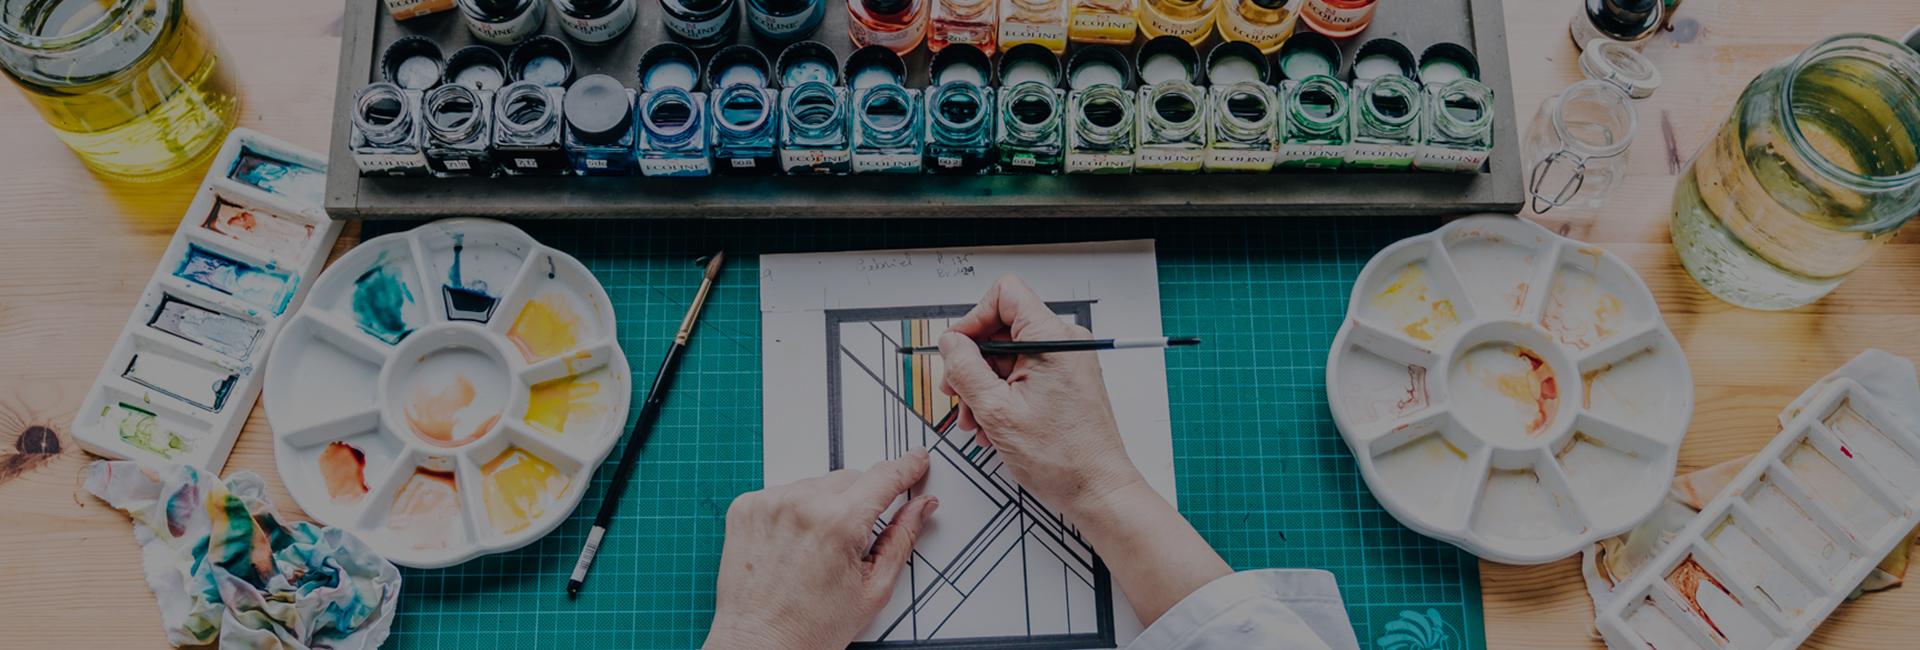 Atelier Mestdagh glasraamkunst creaties